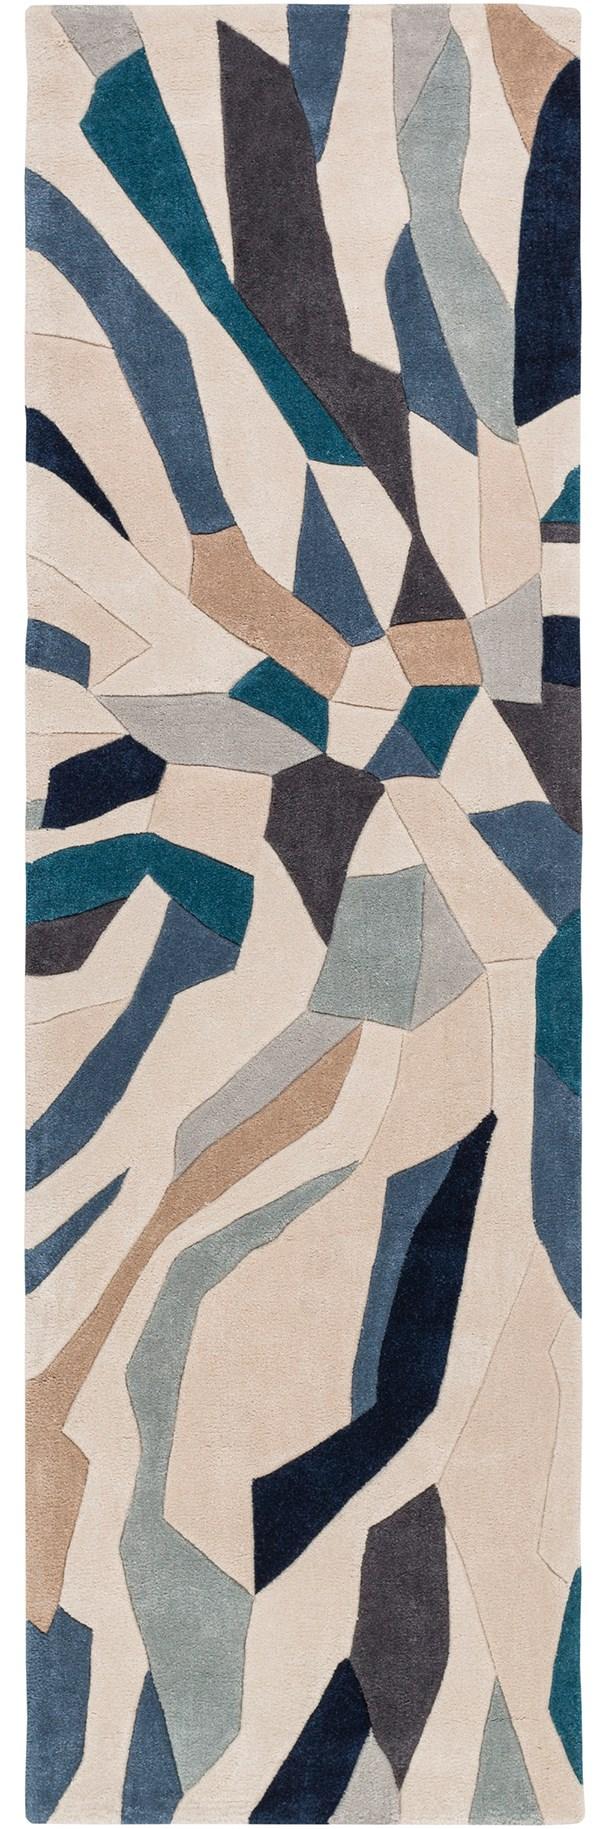 Taupe, Navy, Ivory, Bright Blue, Denim Contemporary / Modern Area Rug